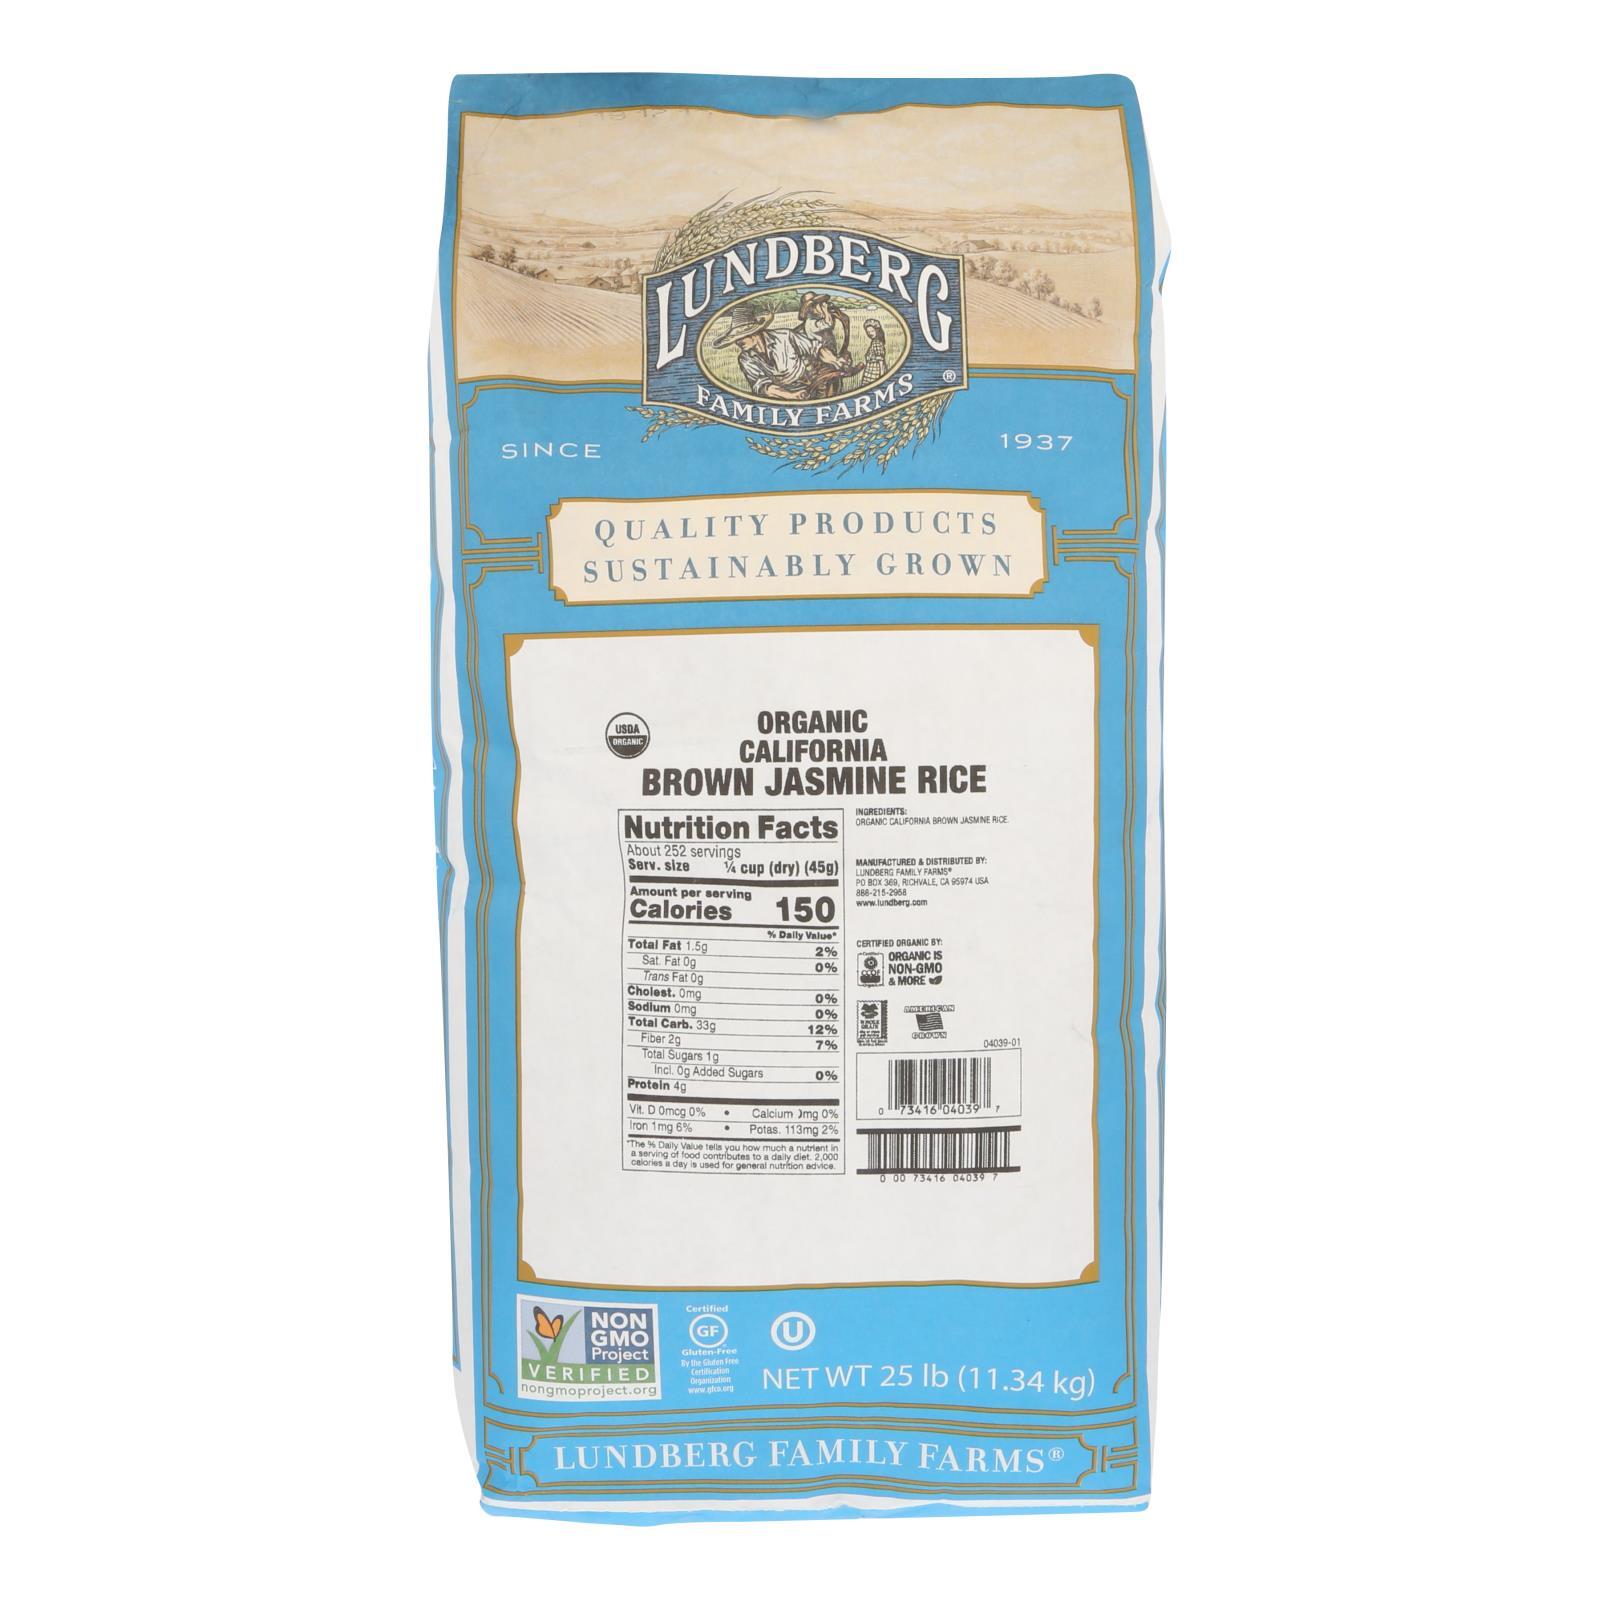 Lundberg Family Farms Organic California Brown Jasmine Rice - Case of 25 lbs %count(alt)